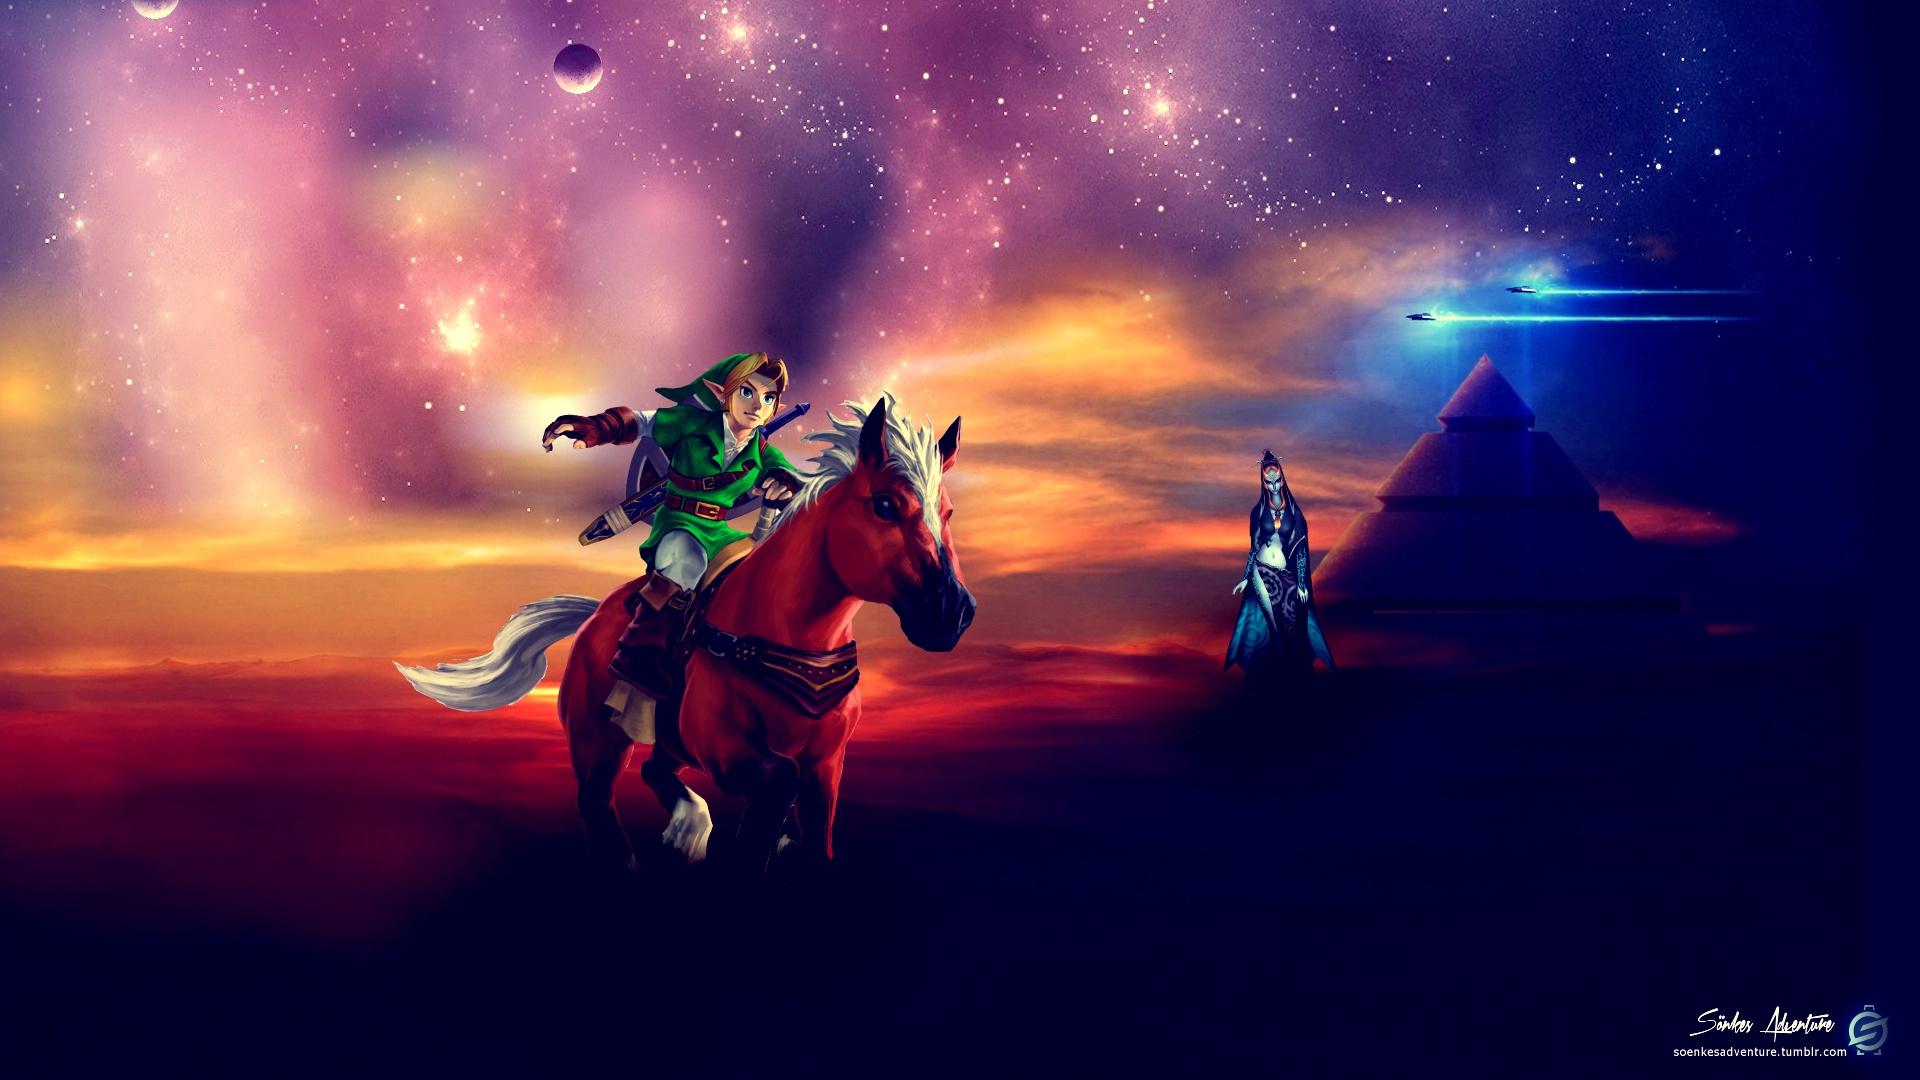 The Legend of Zelda - Space Odyssey 2124 by SoenkesAdventure